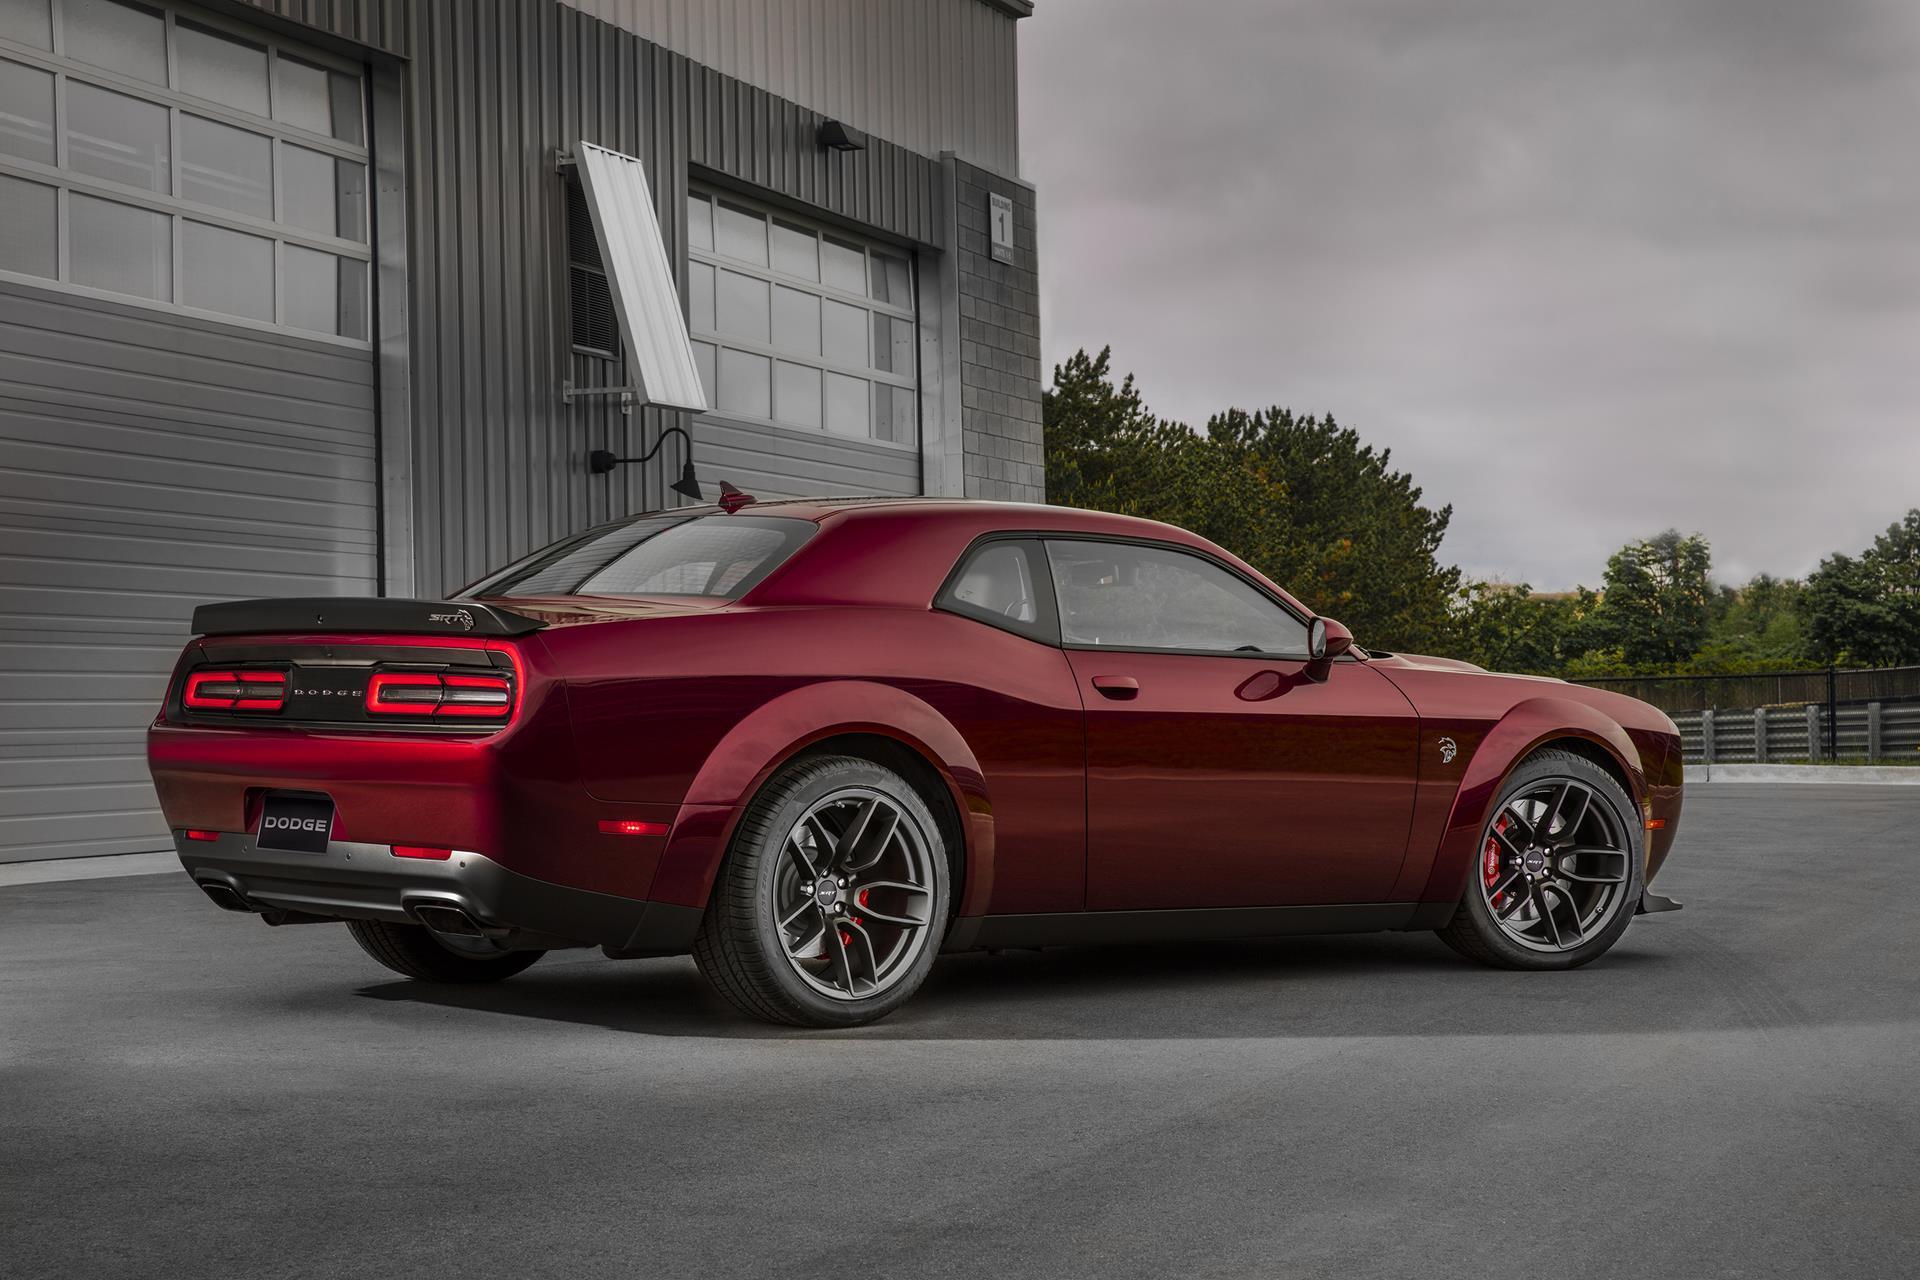 2017 Dodge Challenger Srt Hellcat Widebody News And Information